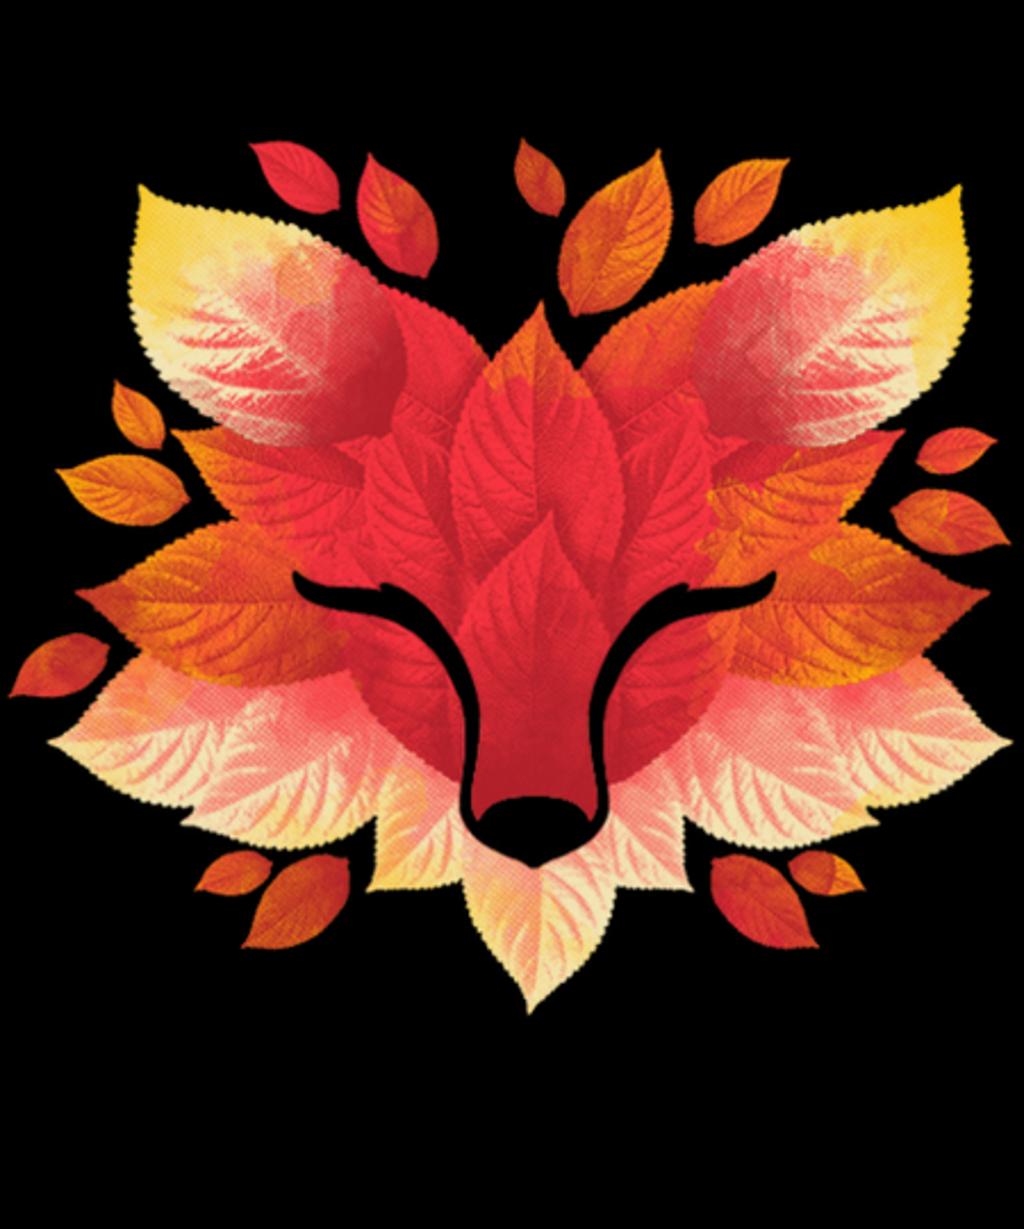 Qwertee: Fox of leaves